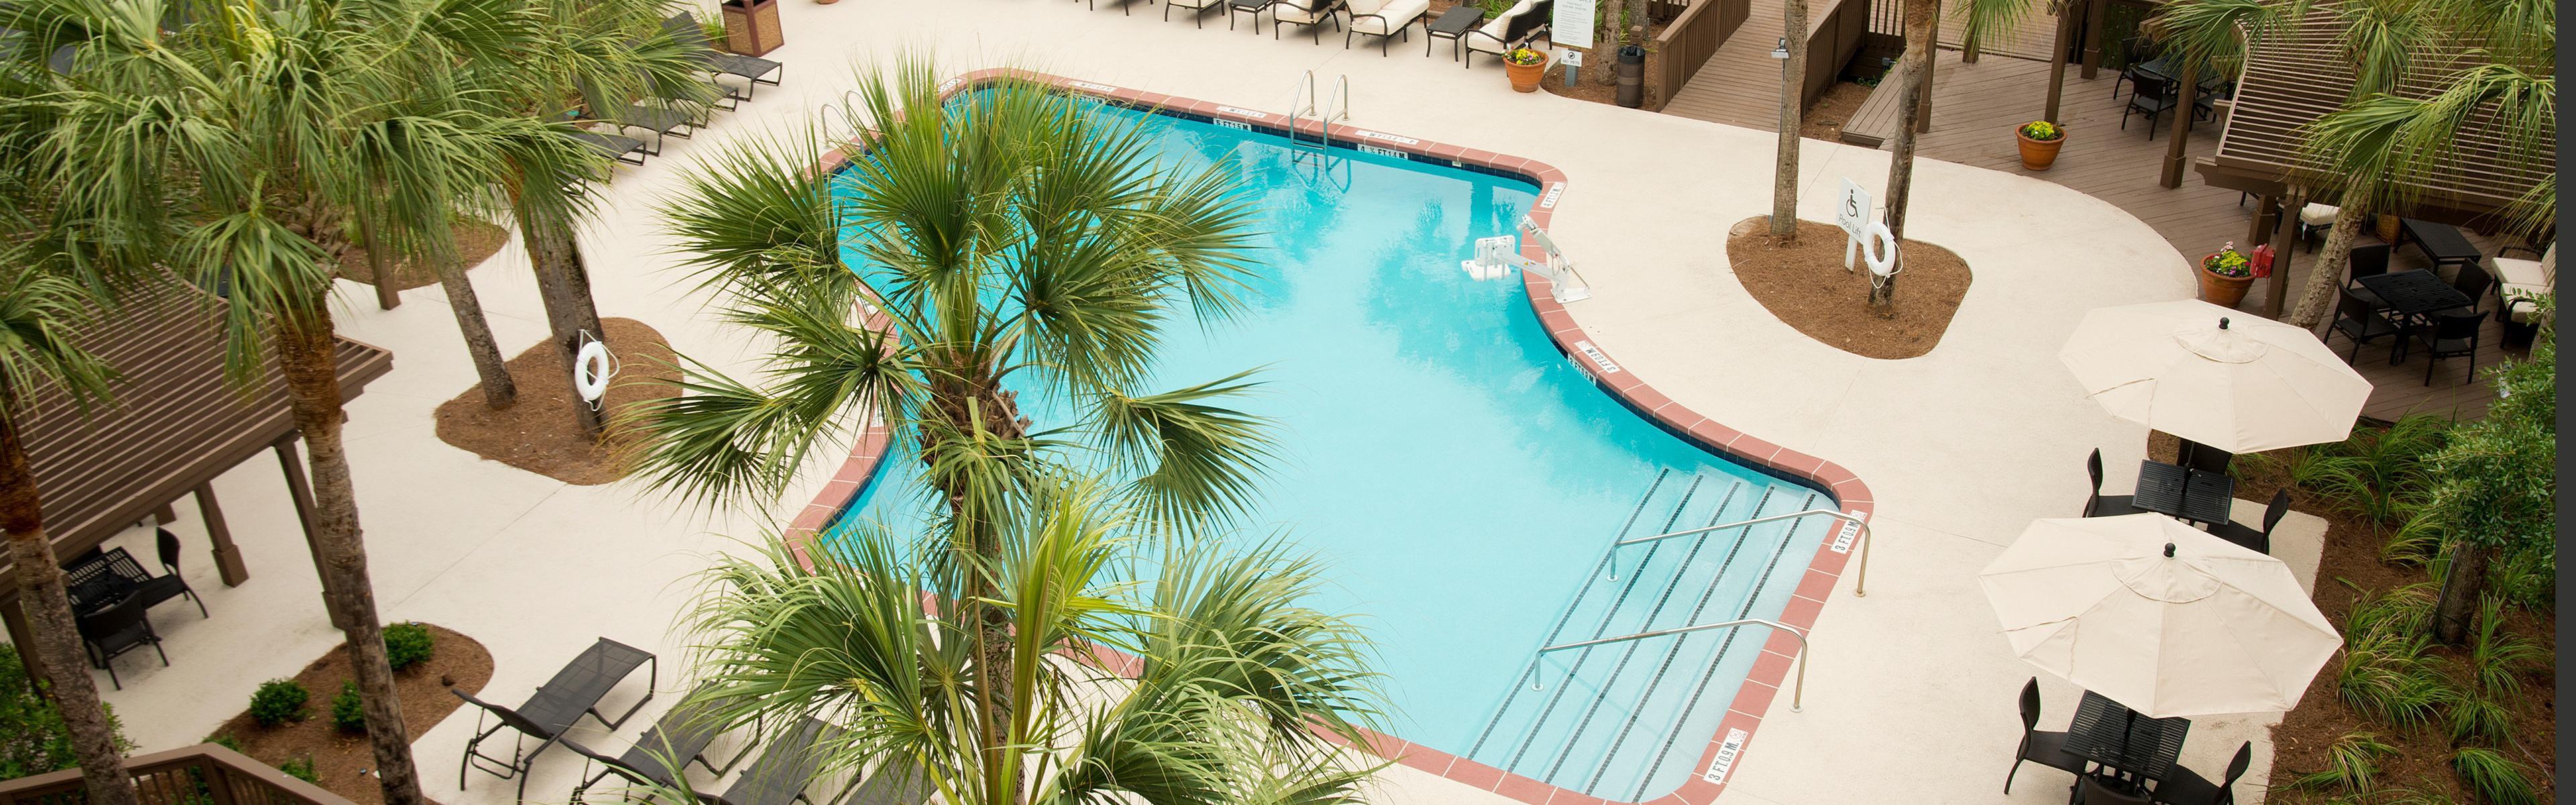 Holiday Inn Express Hilton Head Island image 2